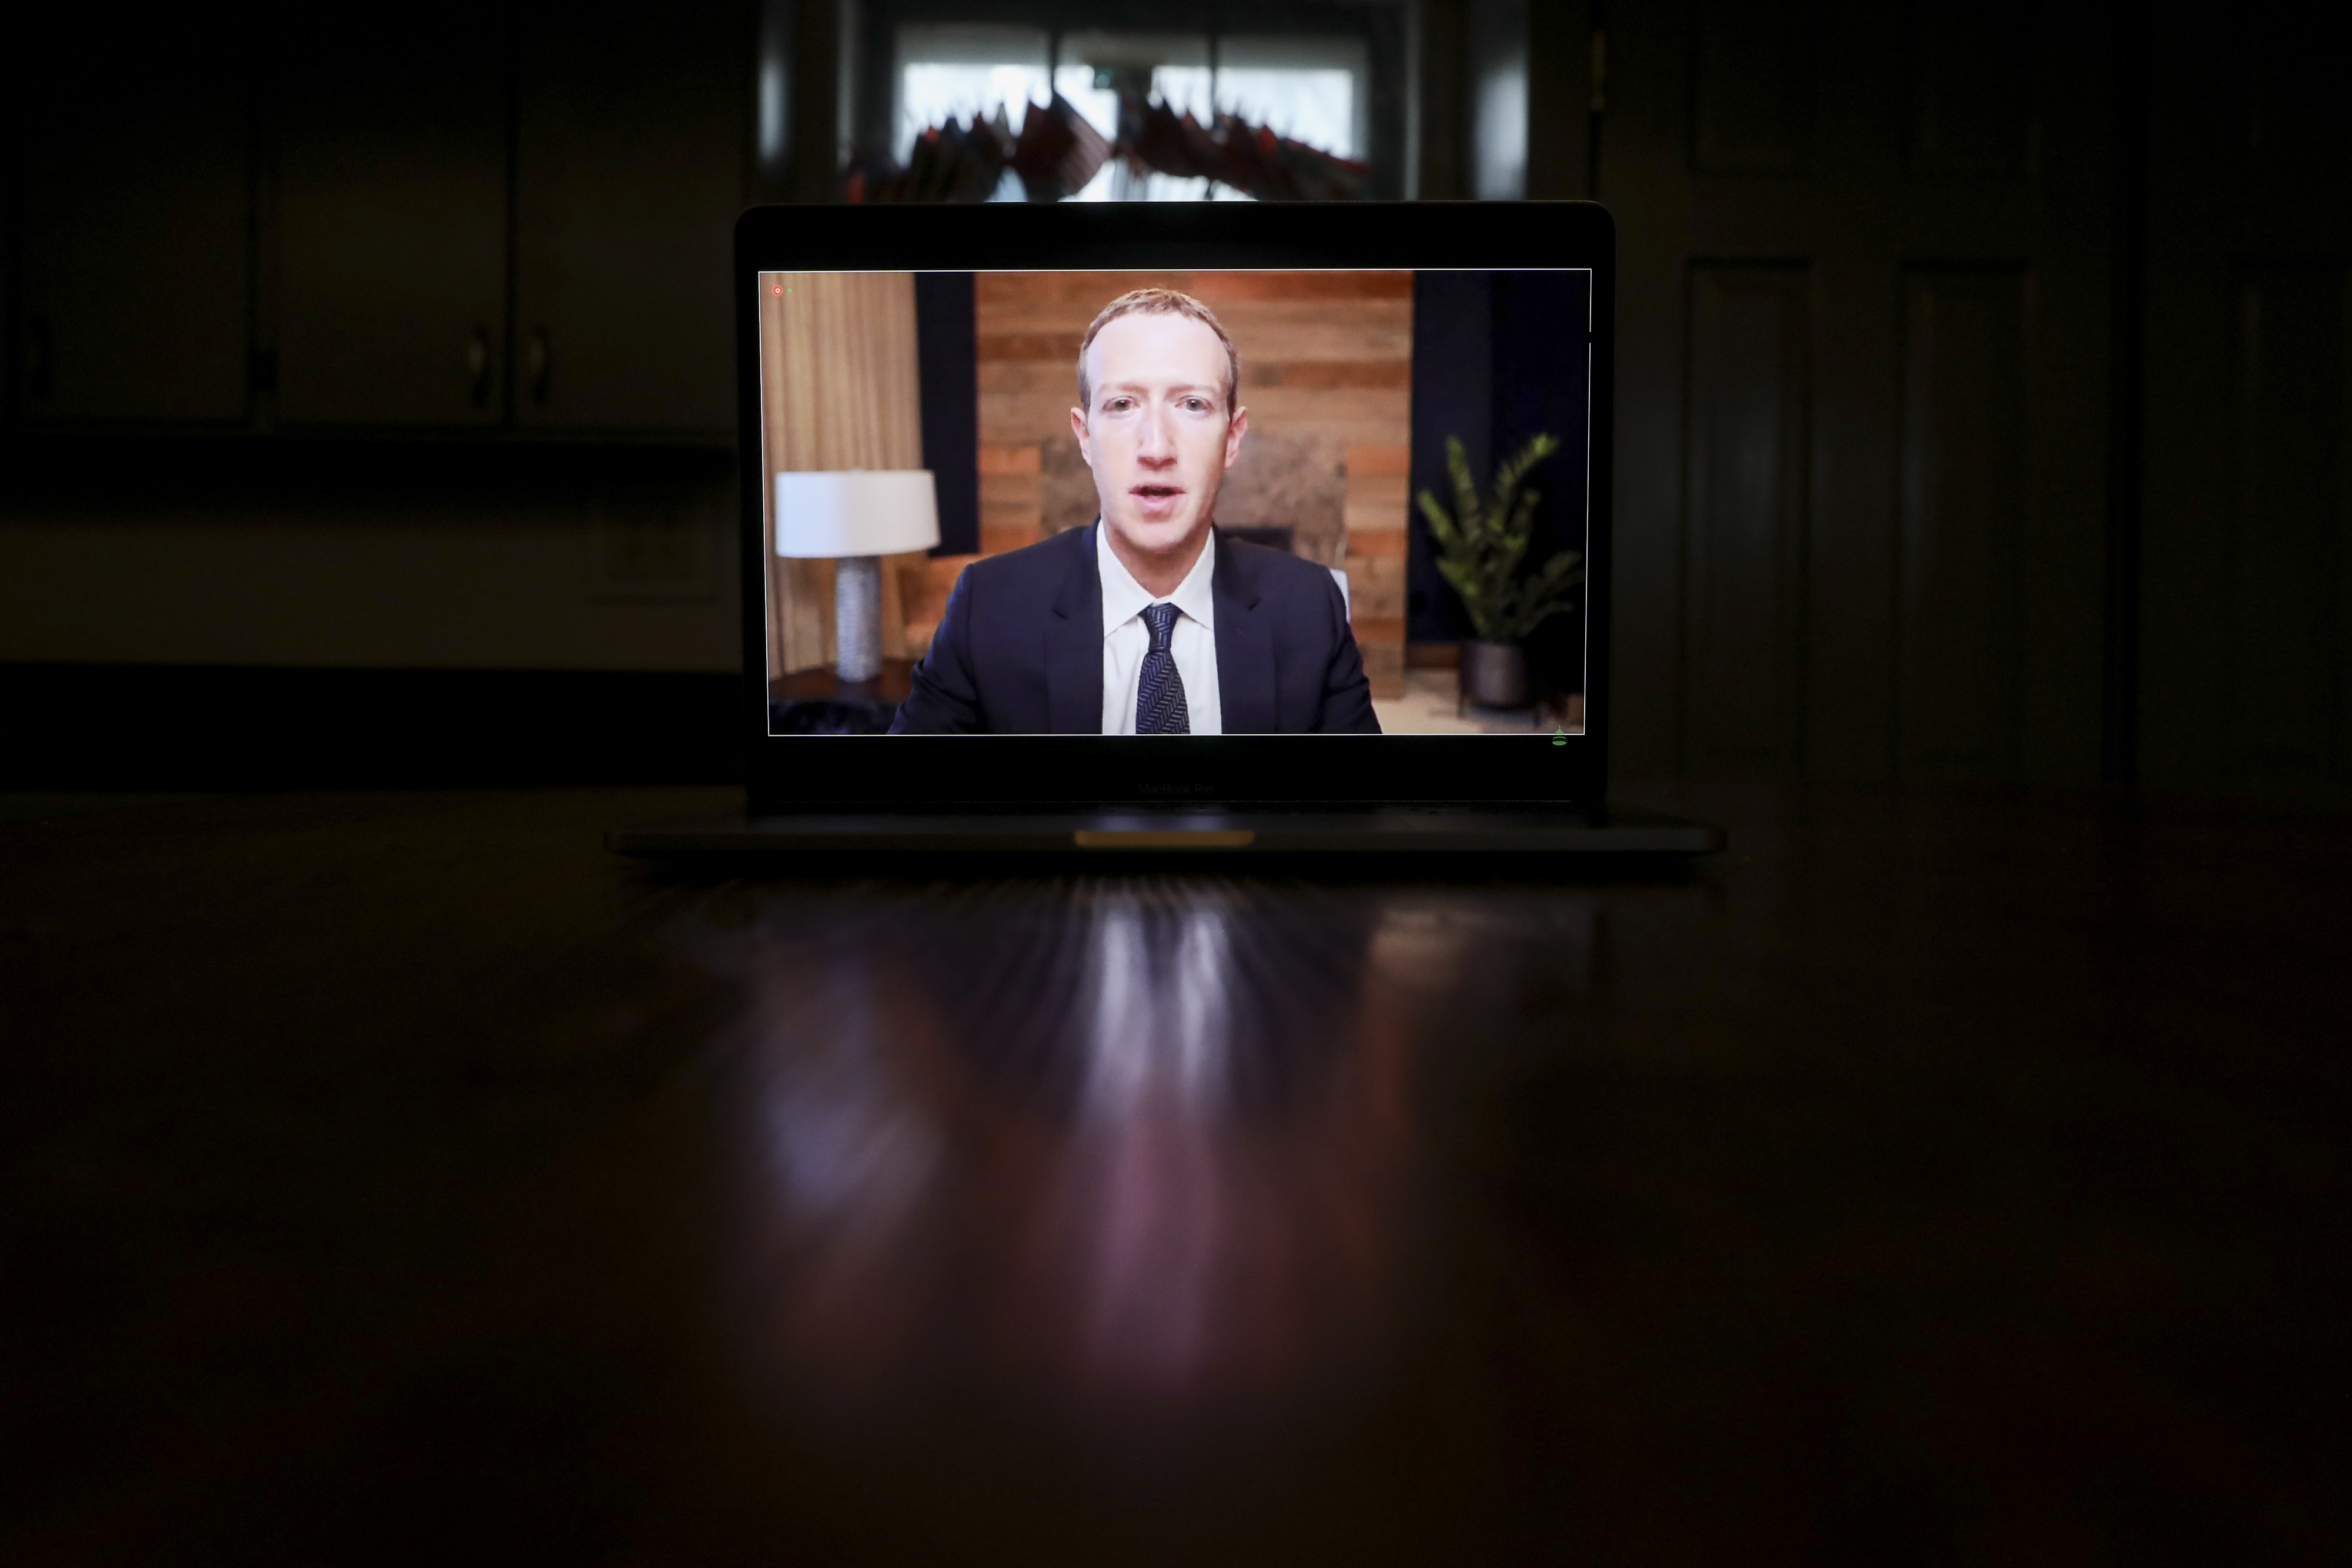 Mark Zuckerberg on a laptop screen.